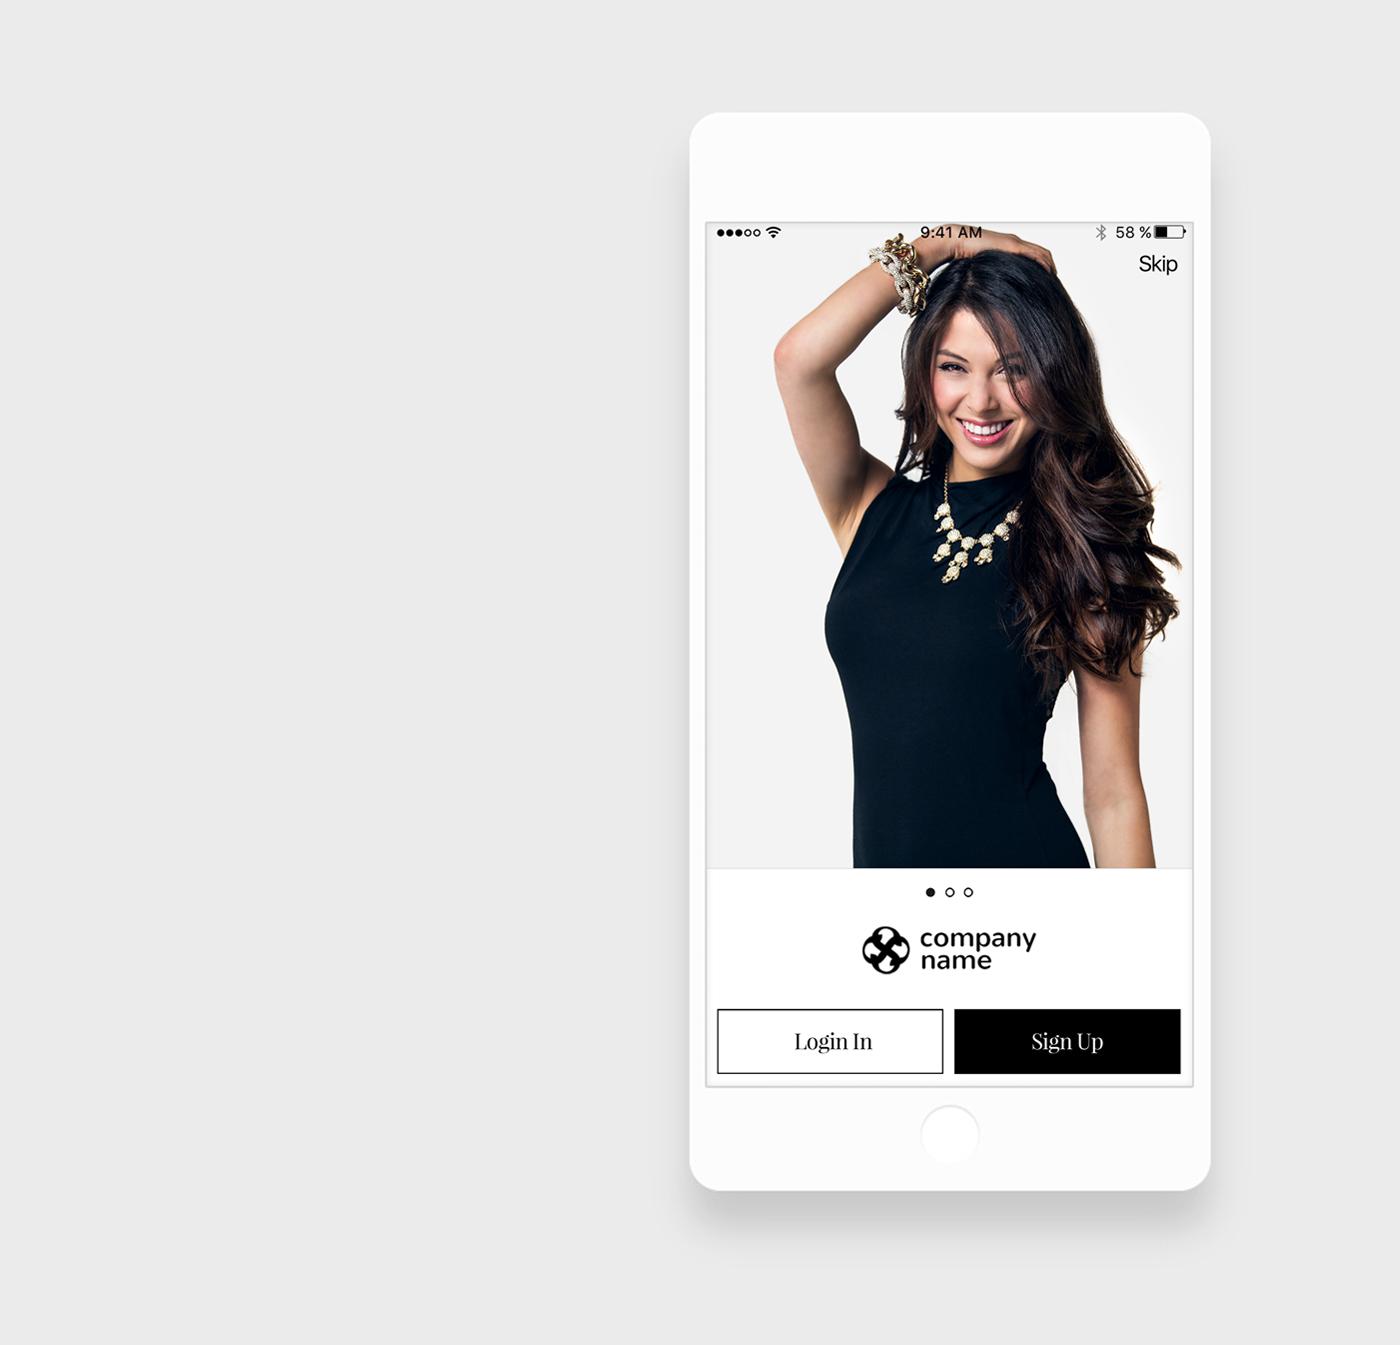 Jewellery%2BApp%2BUI%2BDesigns%2B2 Jewellery App UI Designs download